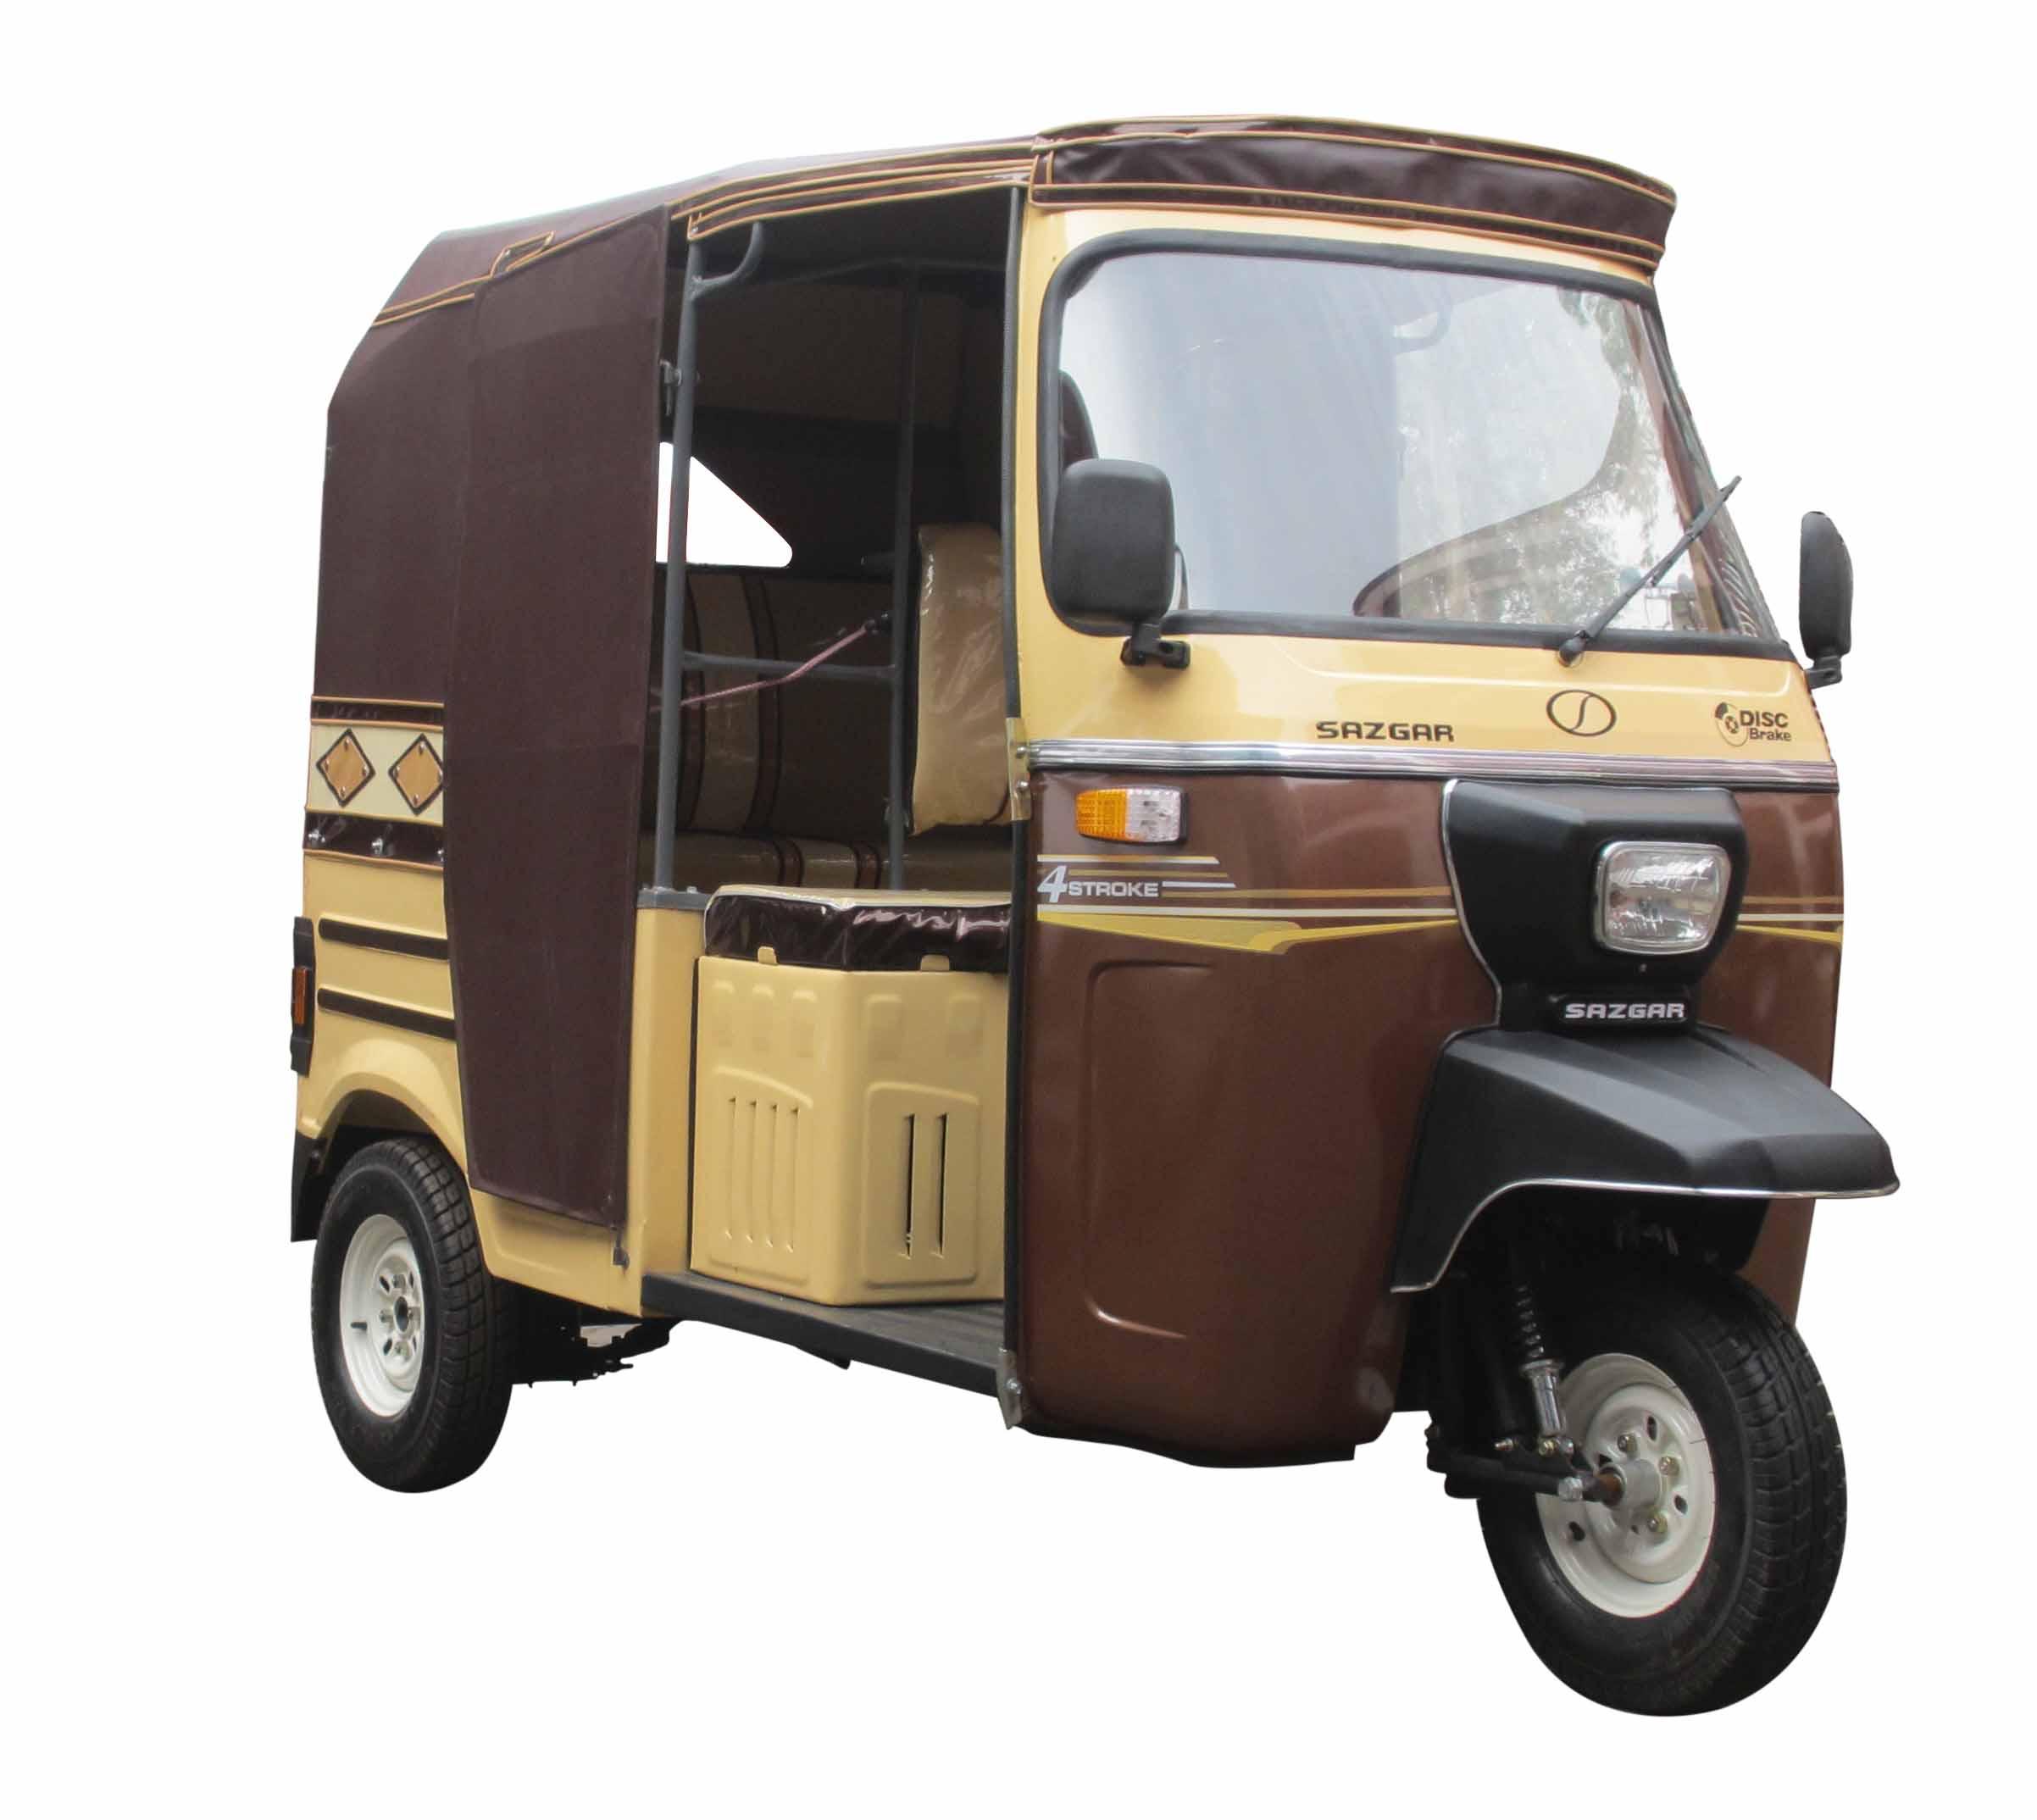 Pakistan's rickshaw brand 'Sazgar' to manufacture cars